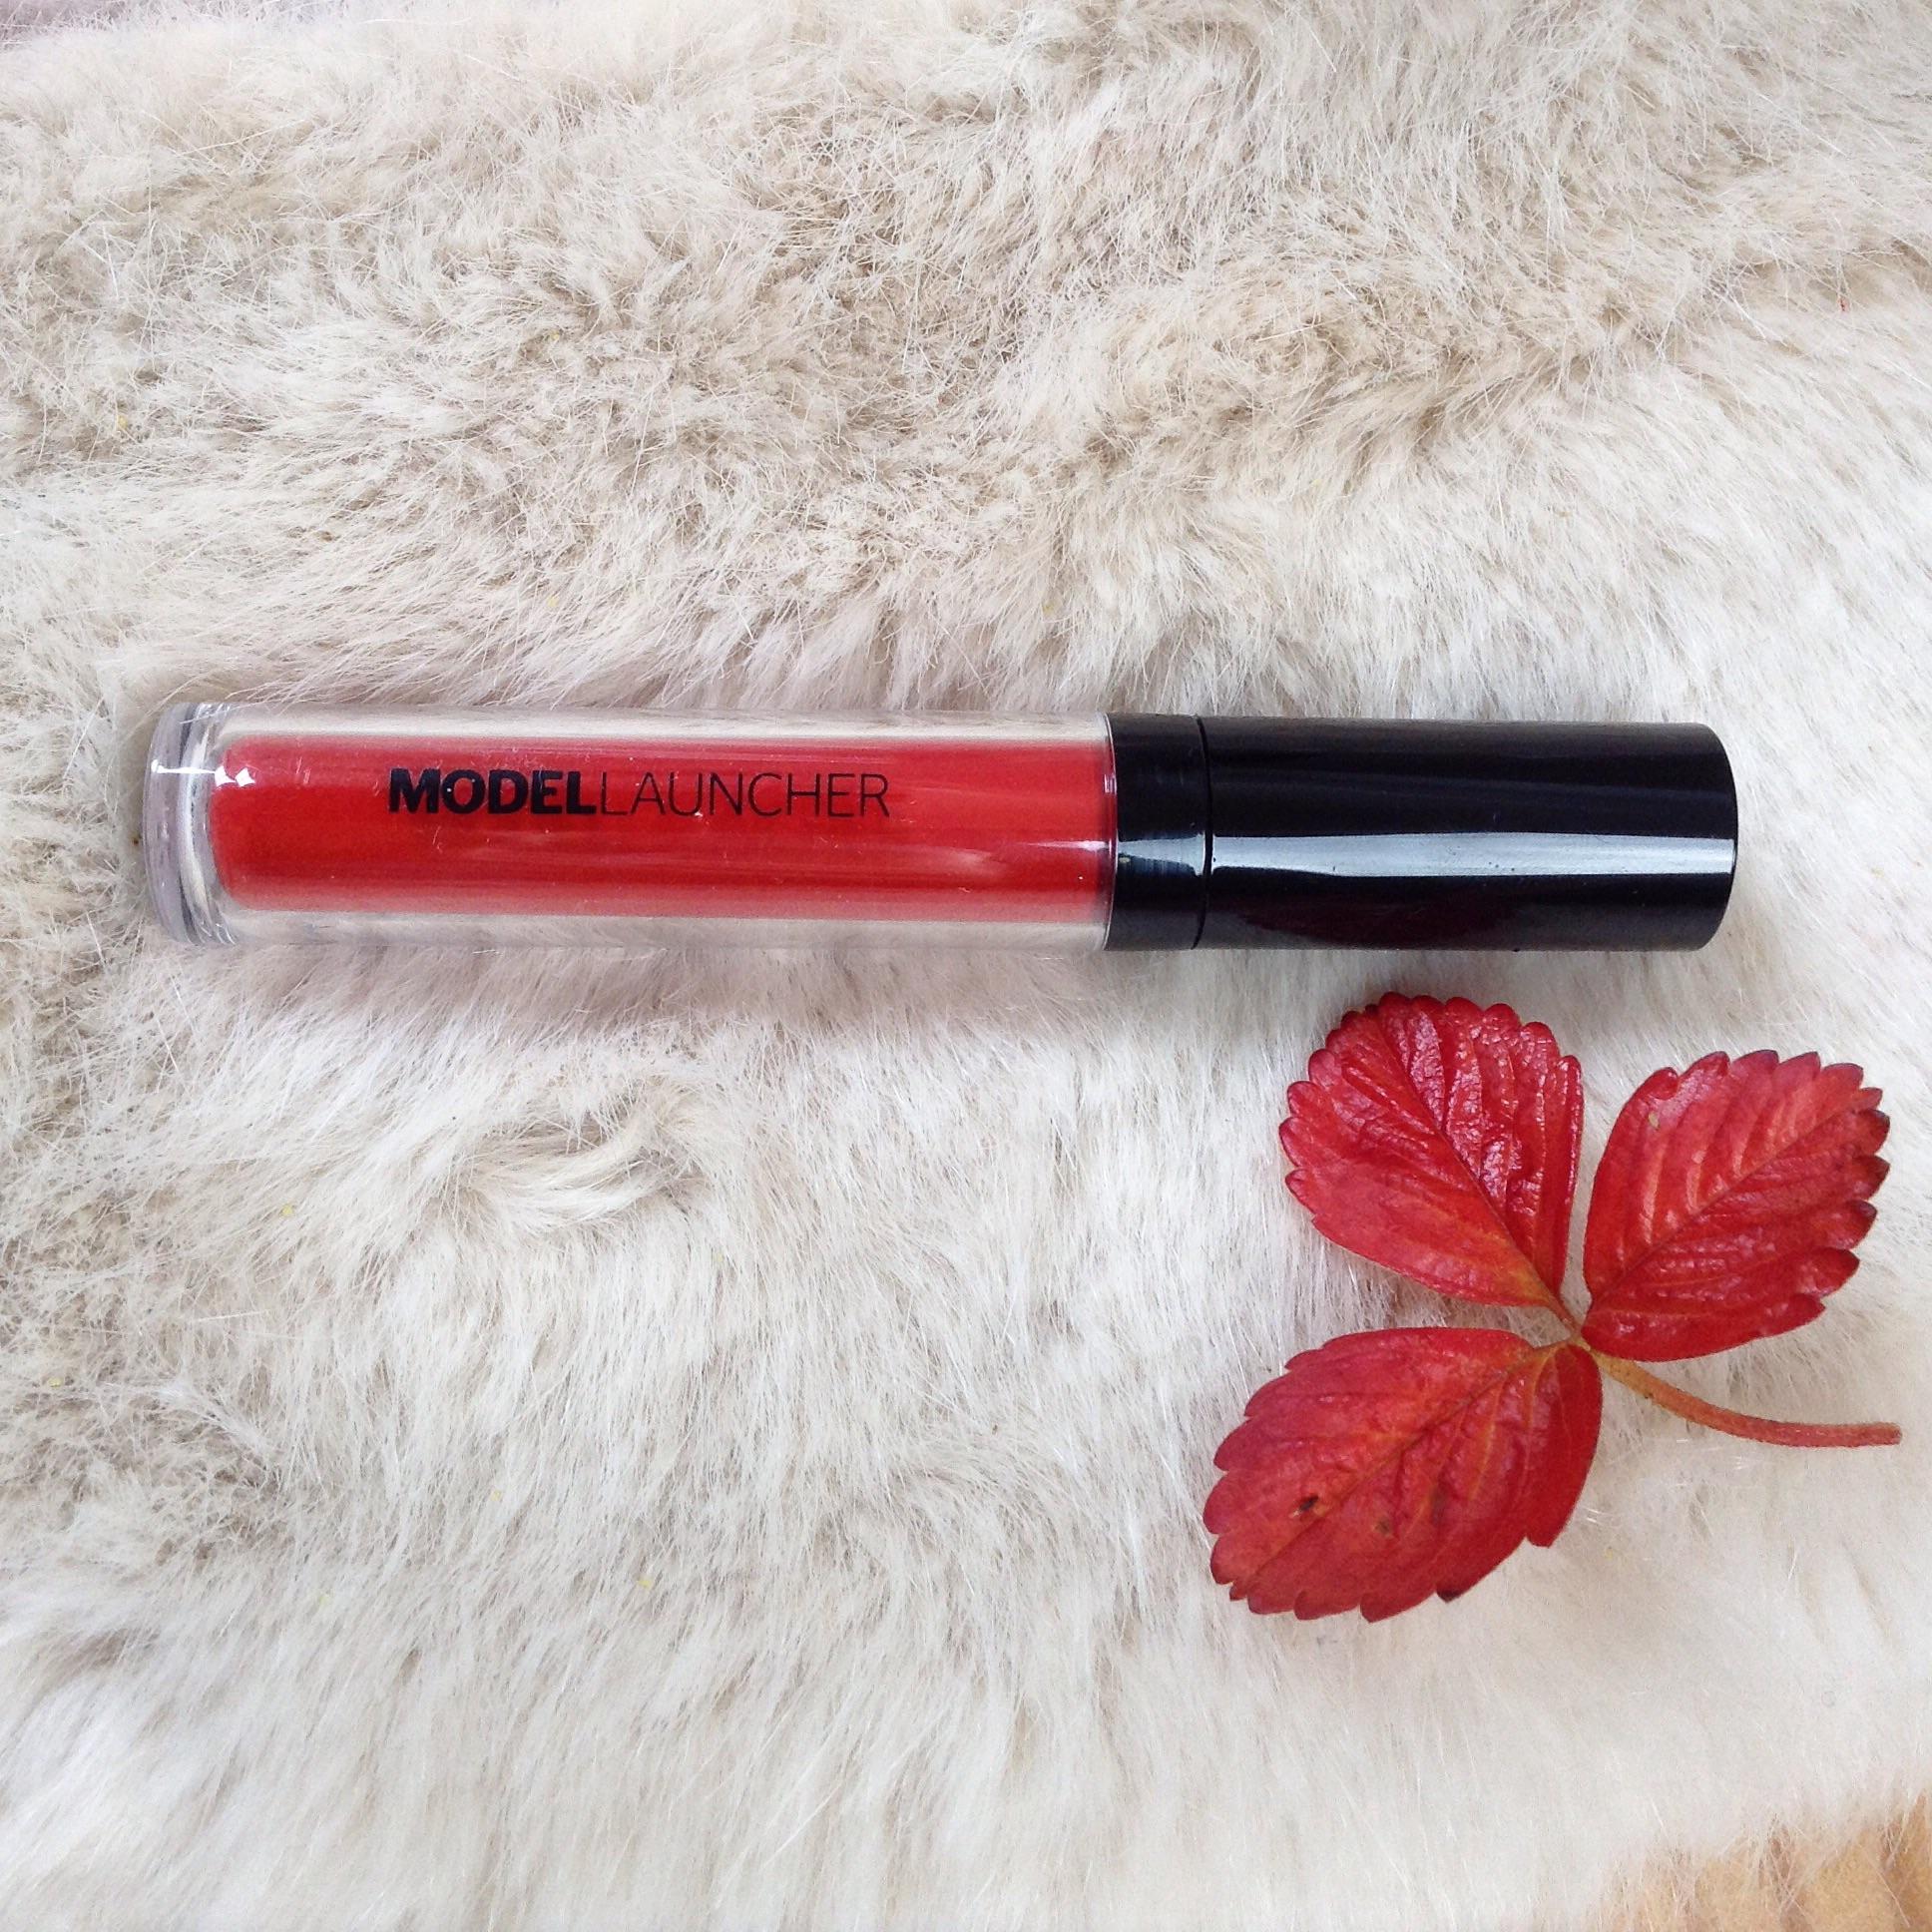 review liquid lipstick modellauncher